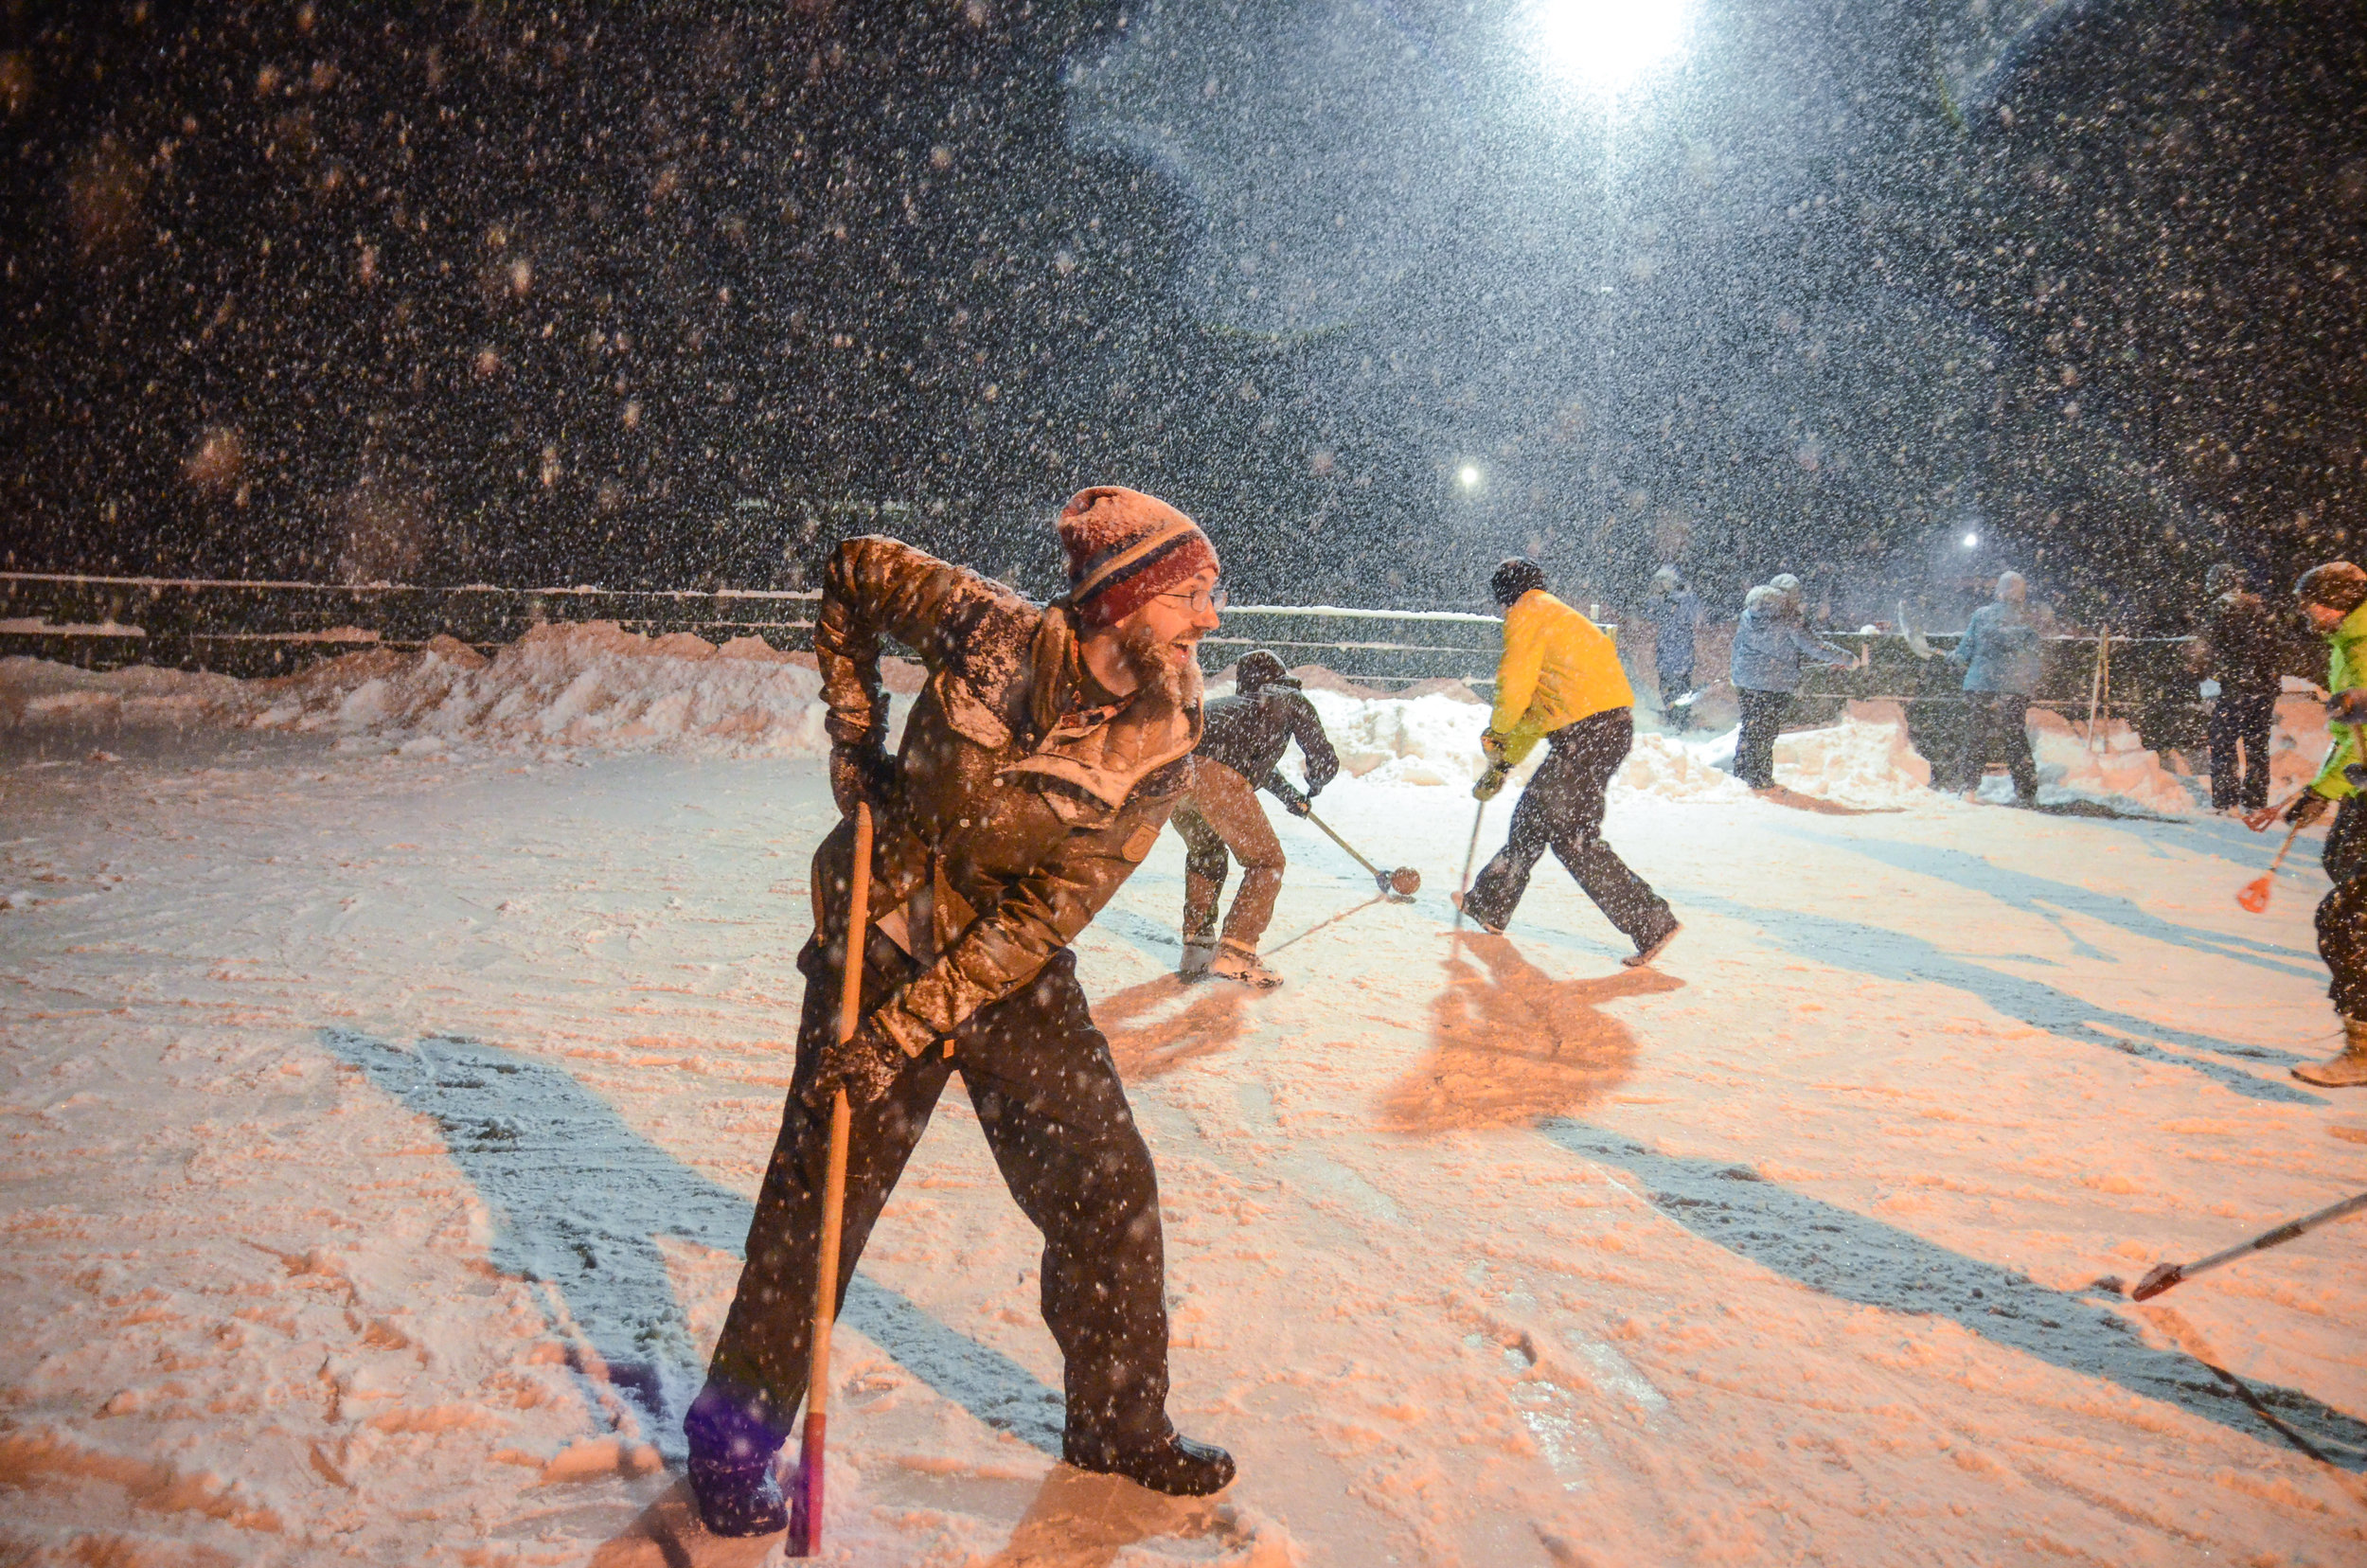 tcc-2018-winter-retreat-6696.jpg